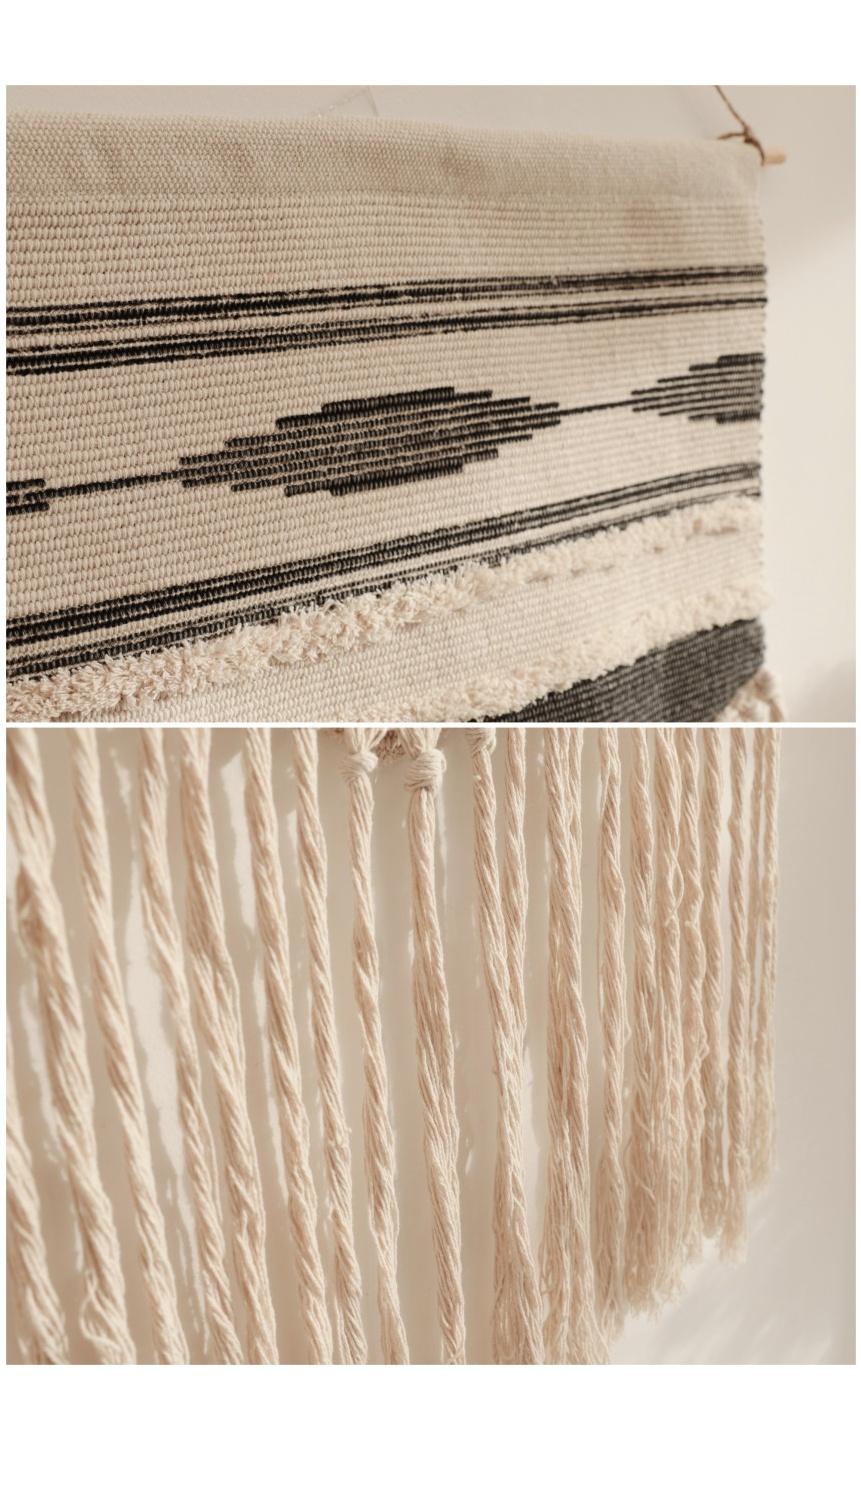 bohemian_cotton_fabricposter_04.jpg